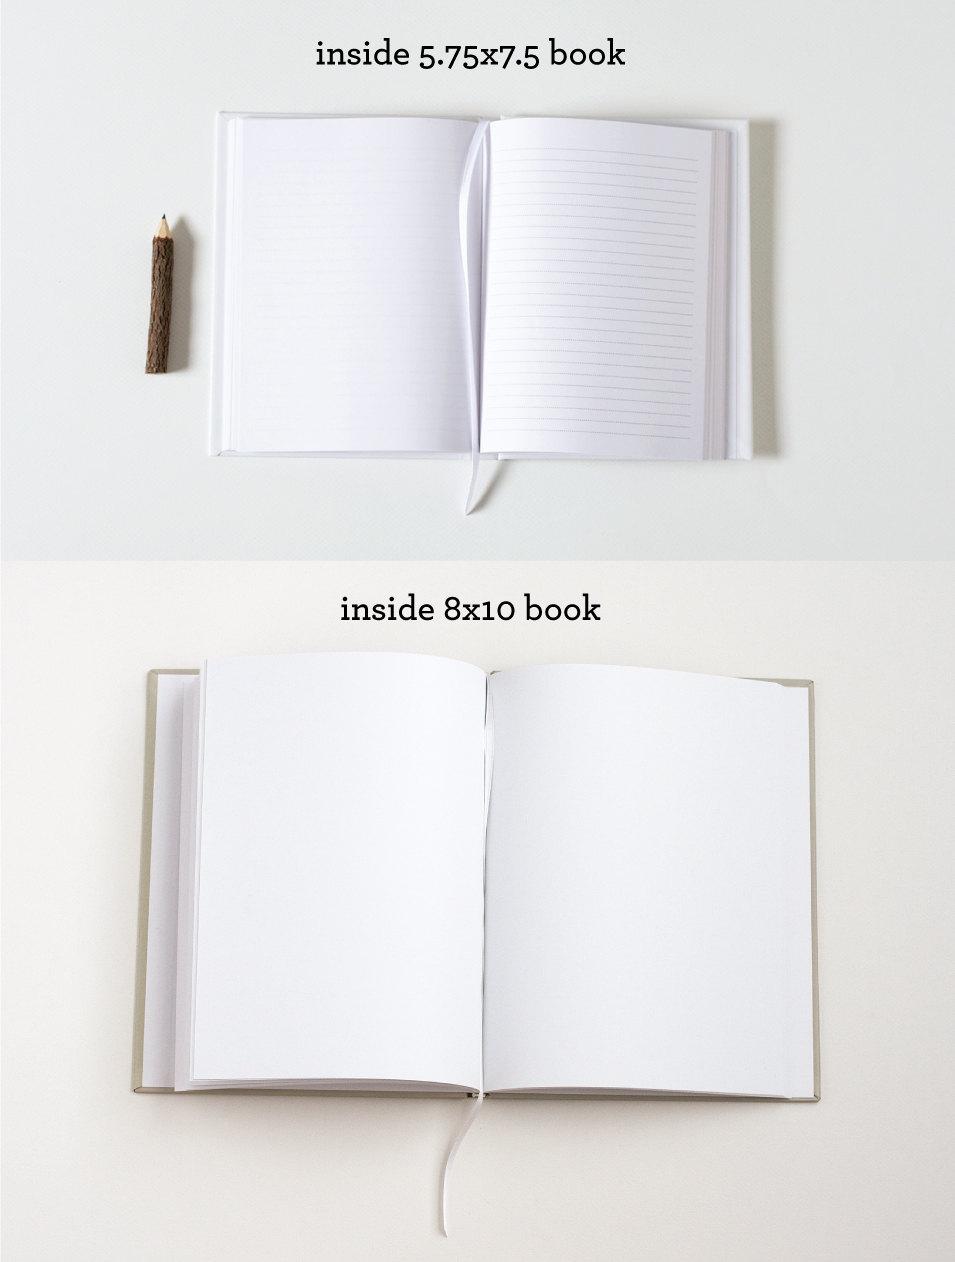 guest book inside